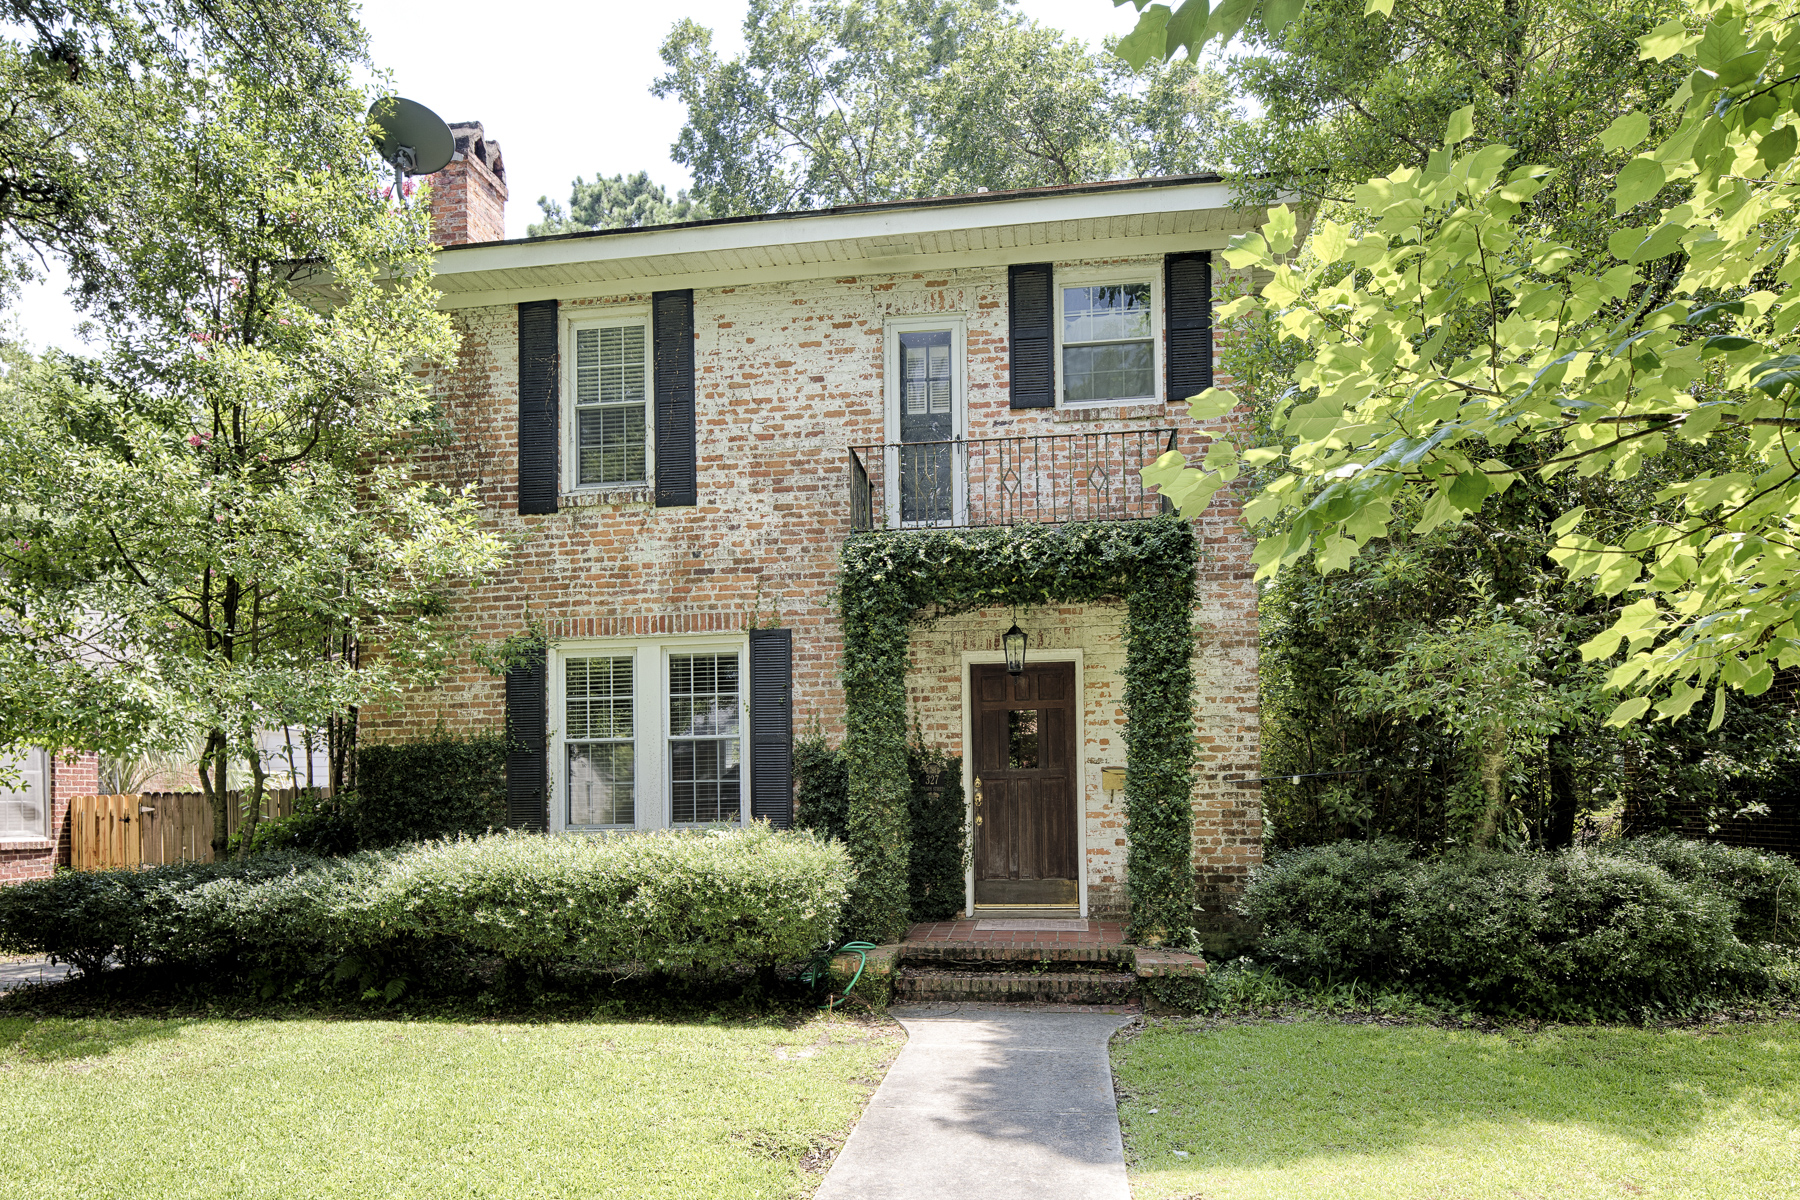 Single Family Home for Sale at 327 E. 56th St. 327 East 56th Street Ardsley Park, Savannah, Georgia 31405 United States